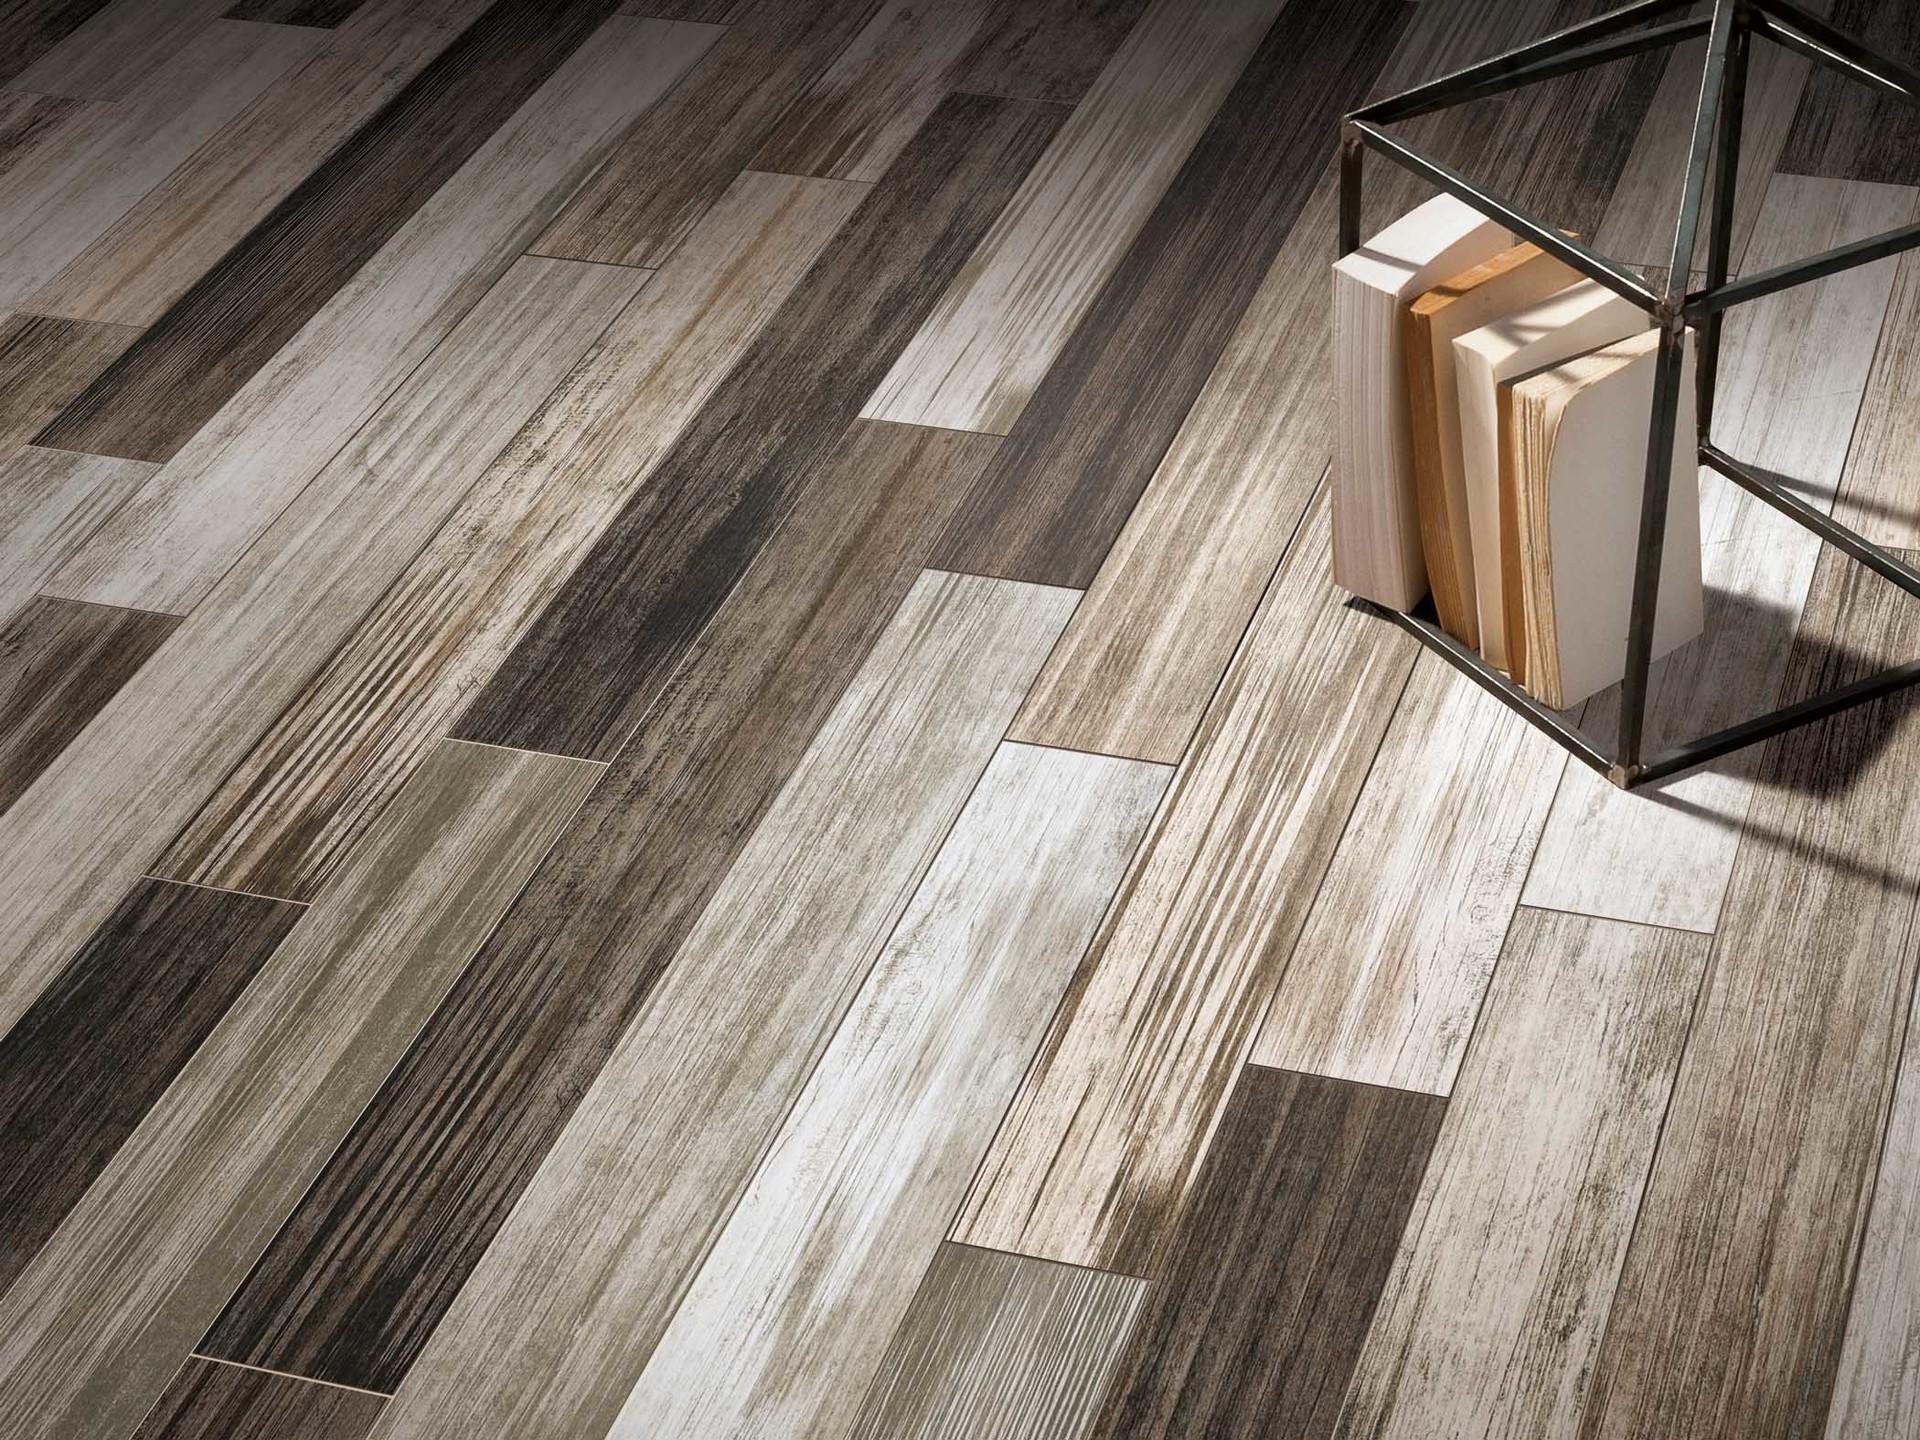 Low water absorption wood imitation porcelain tiles 150x900